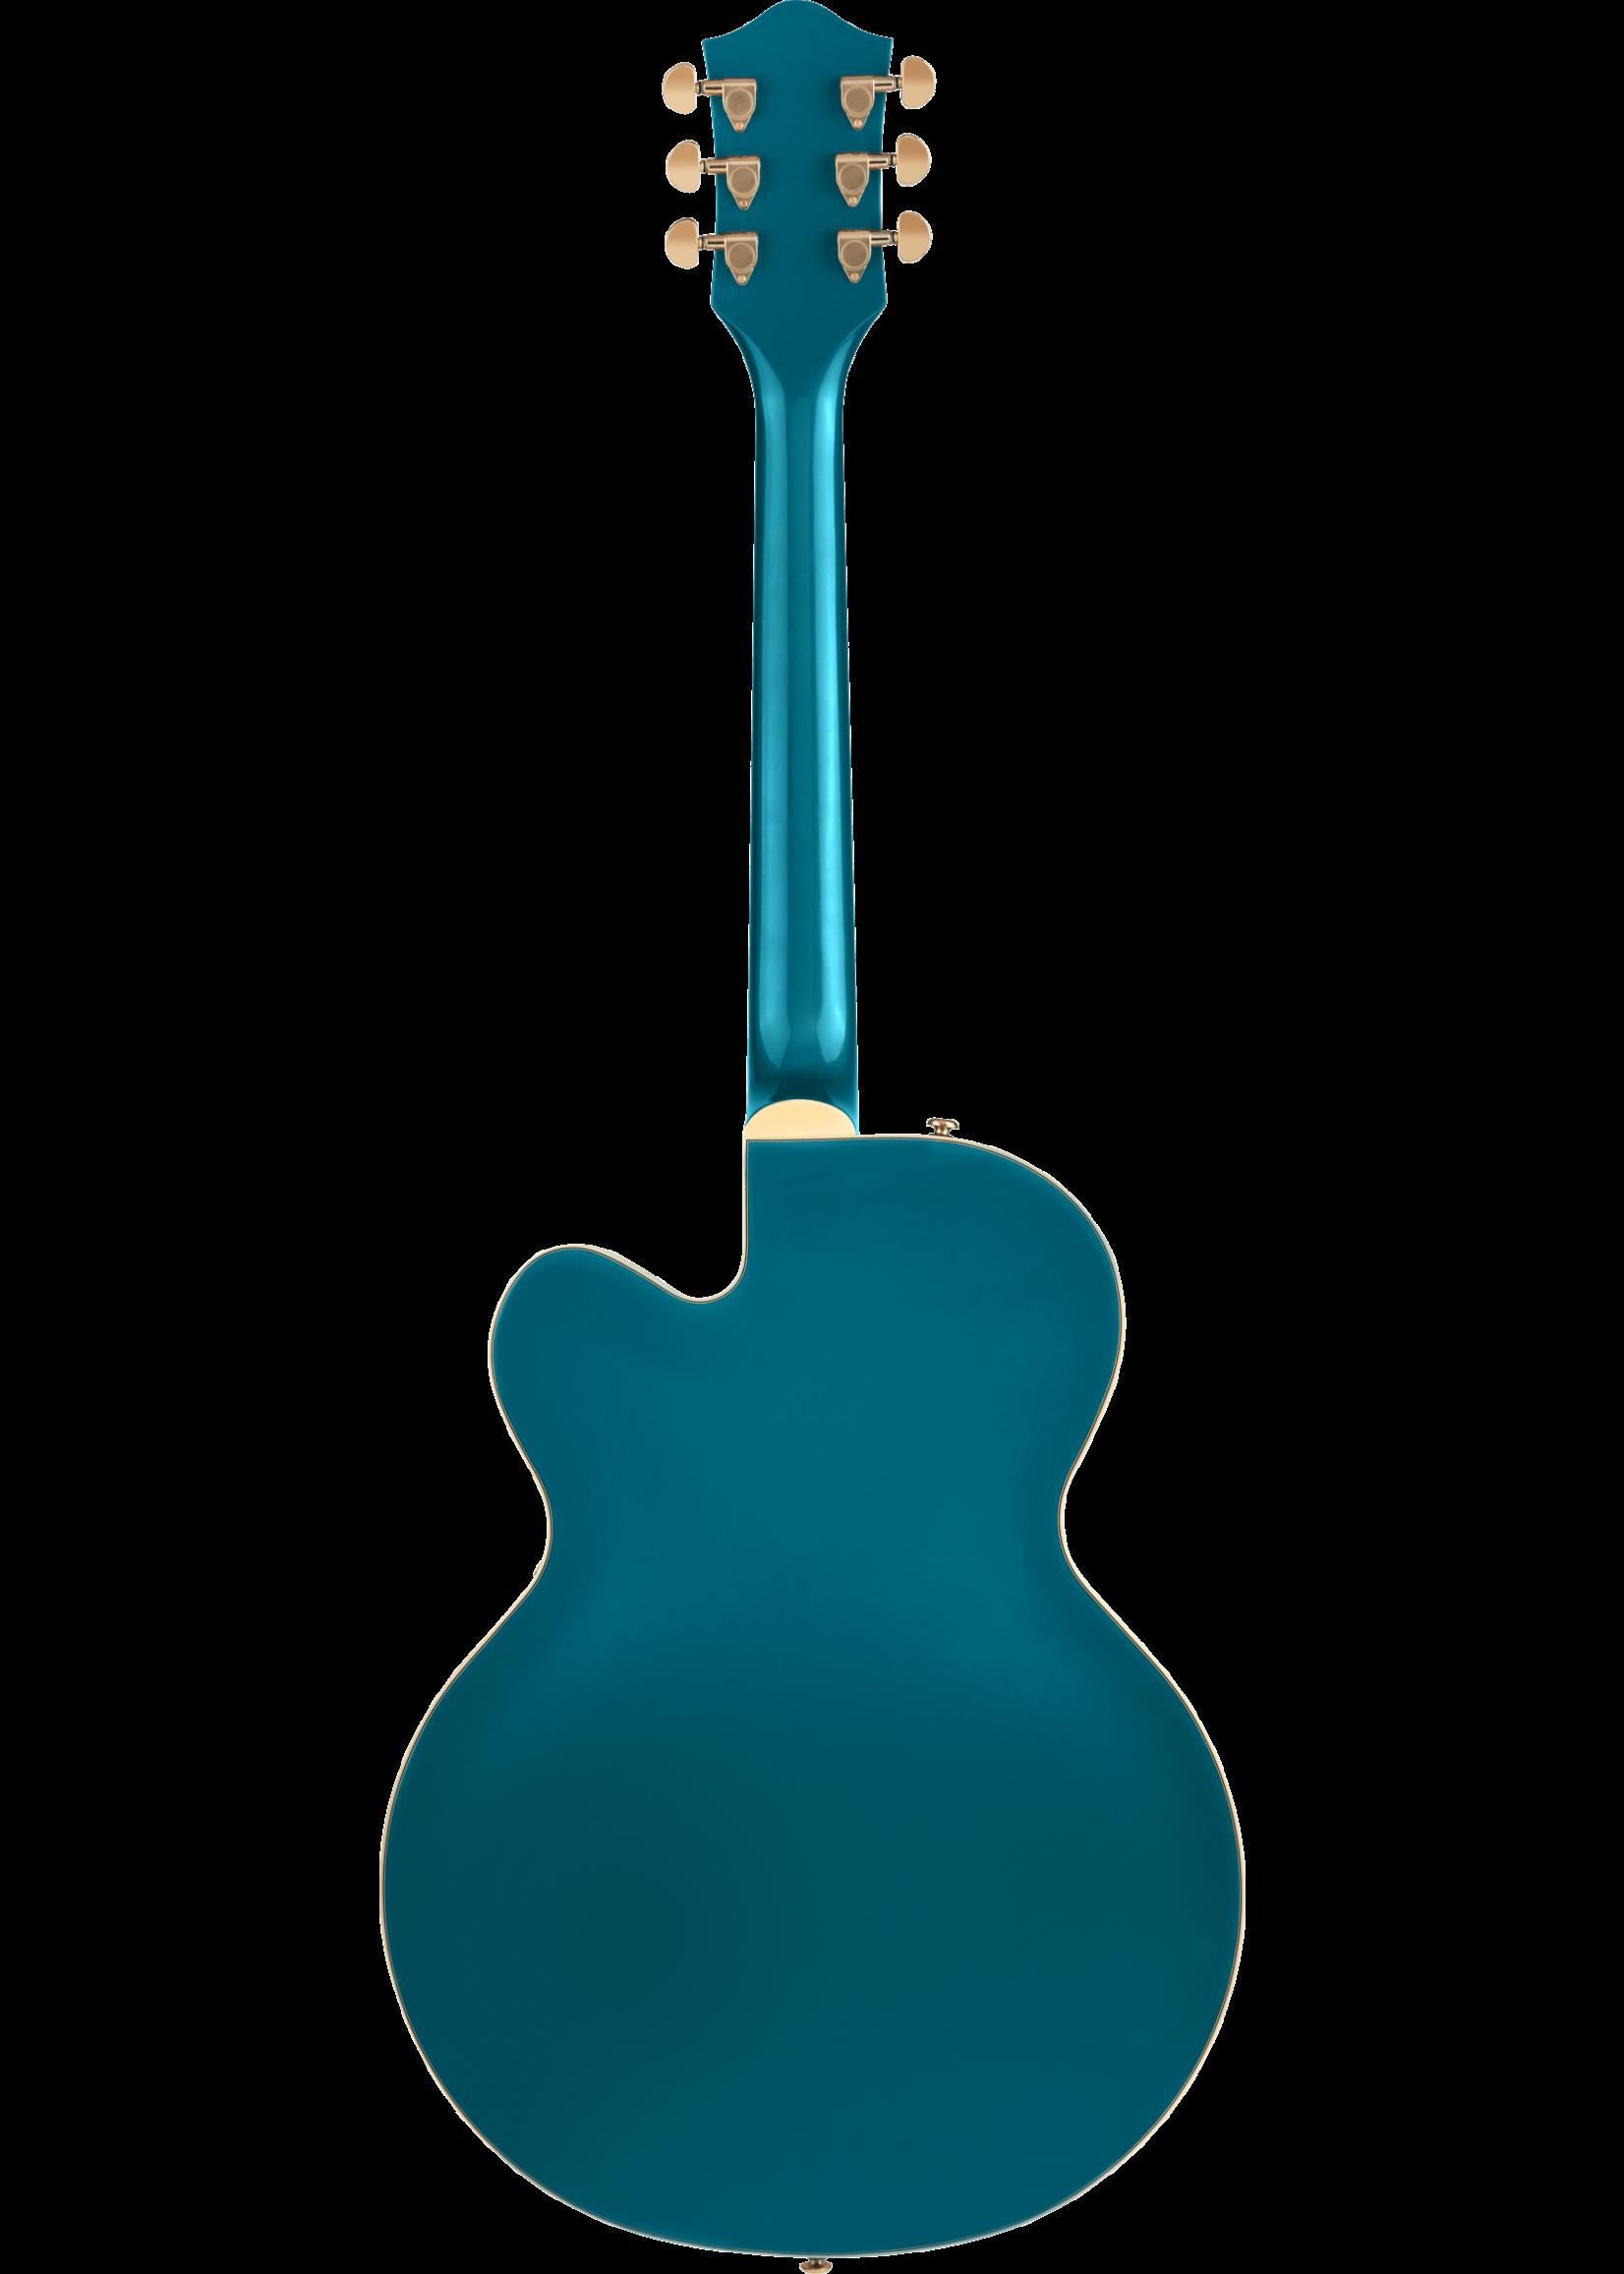 Gretsch Gretsch G2410TG Streamliner Hollow Body Single Cutaway with Bigsby Ocean Turquoise